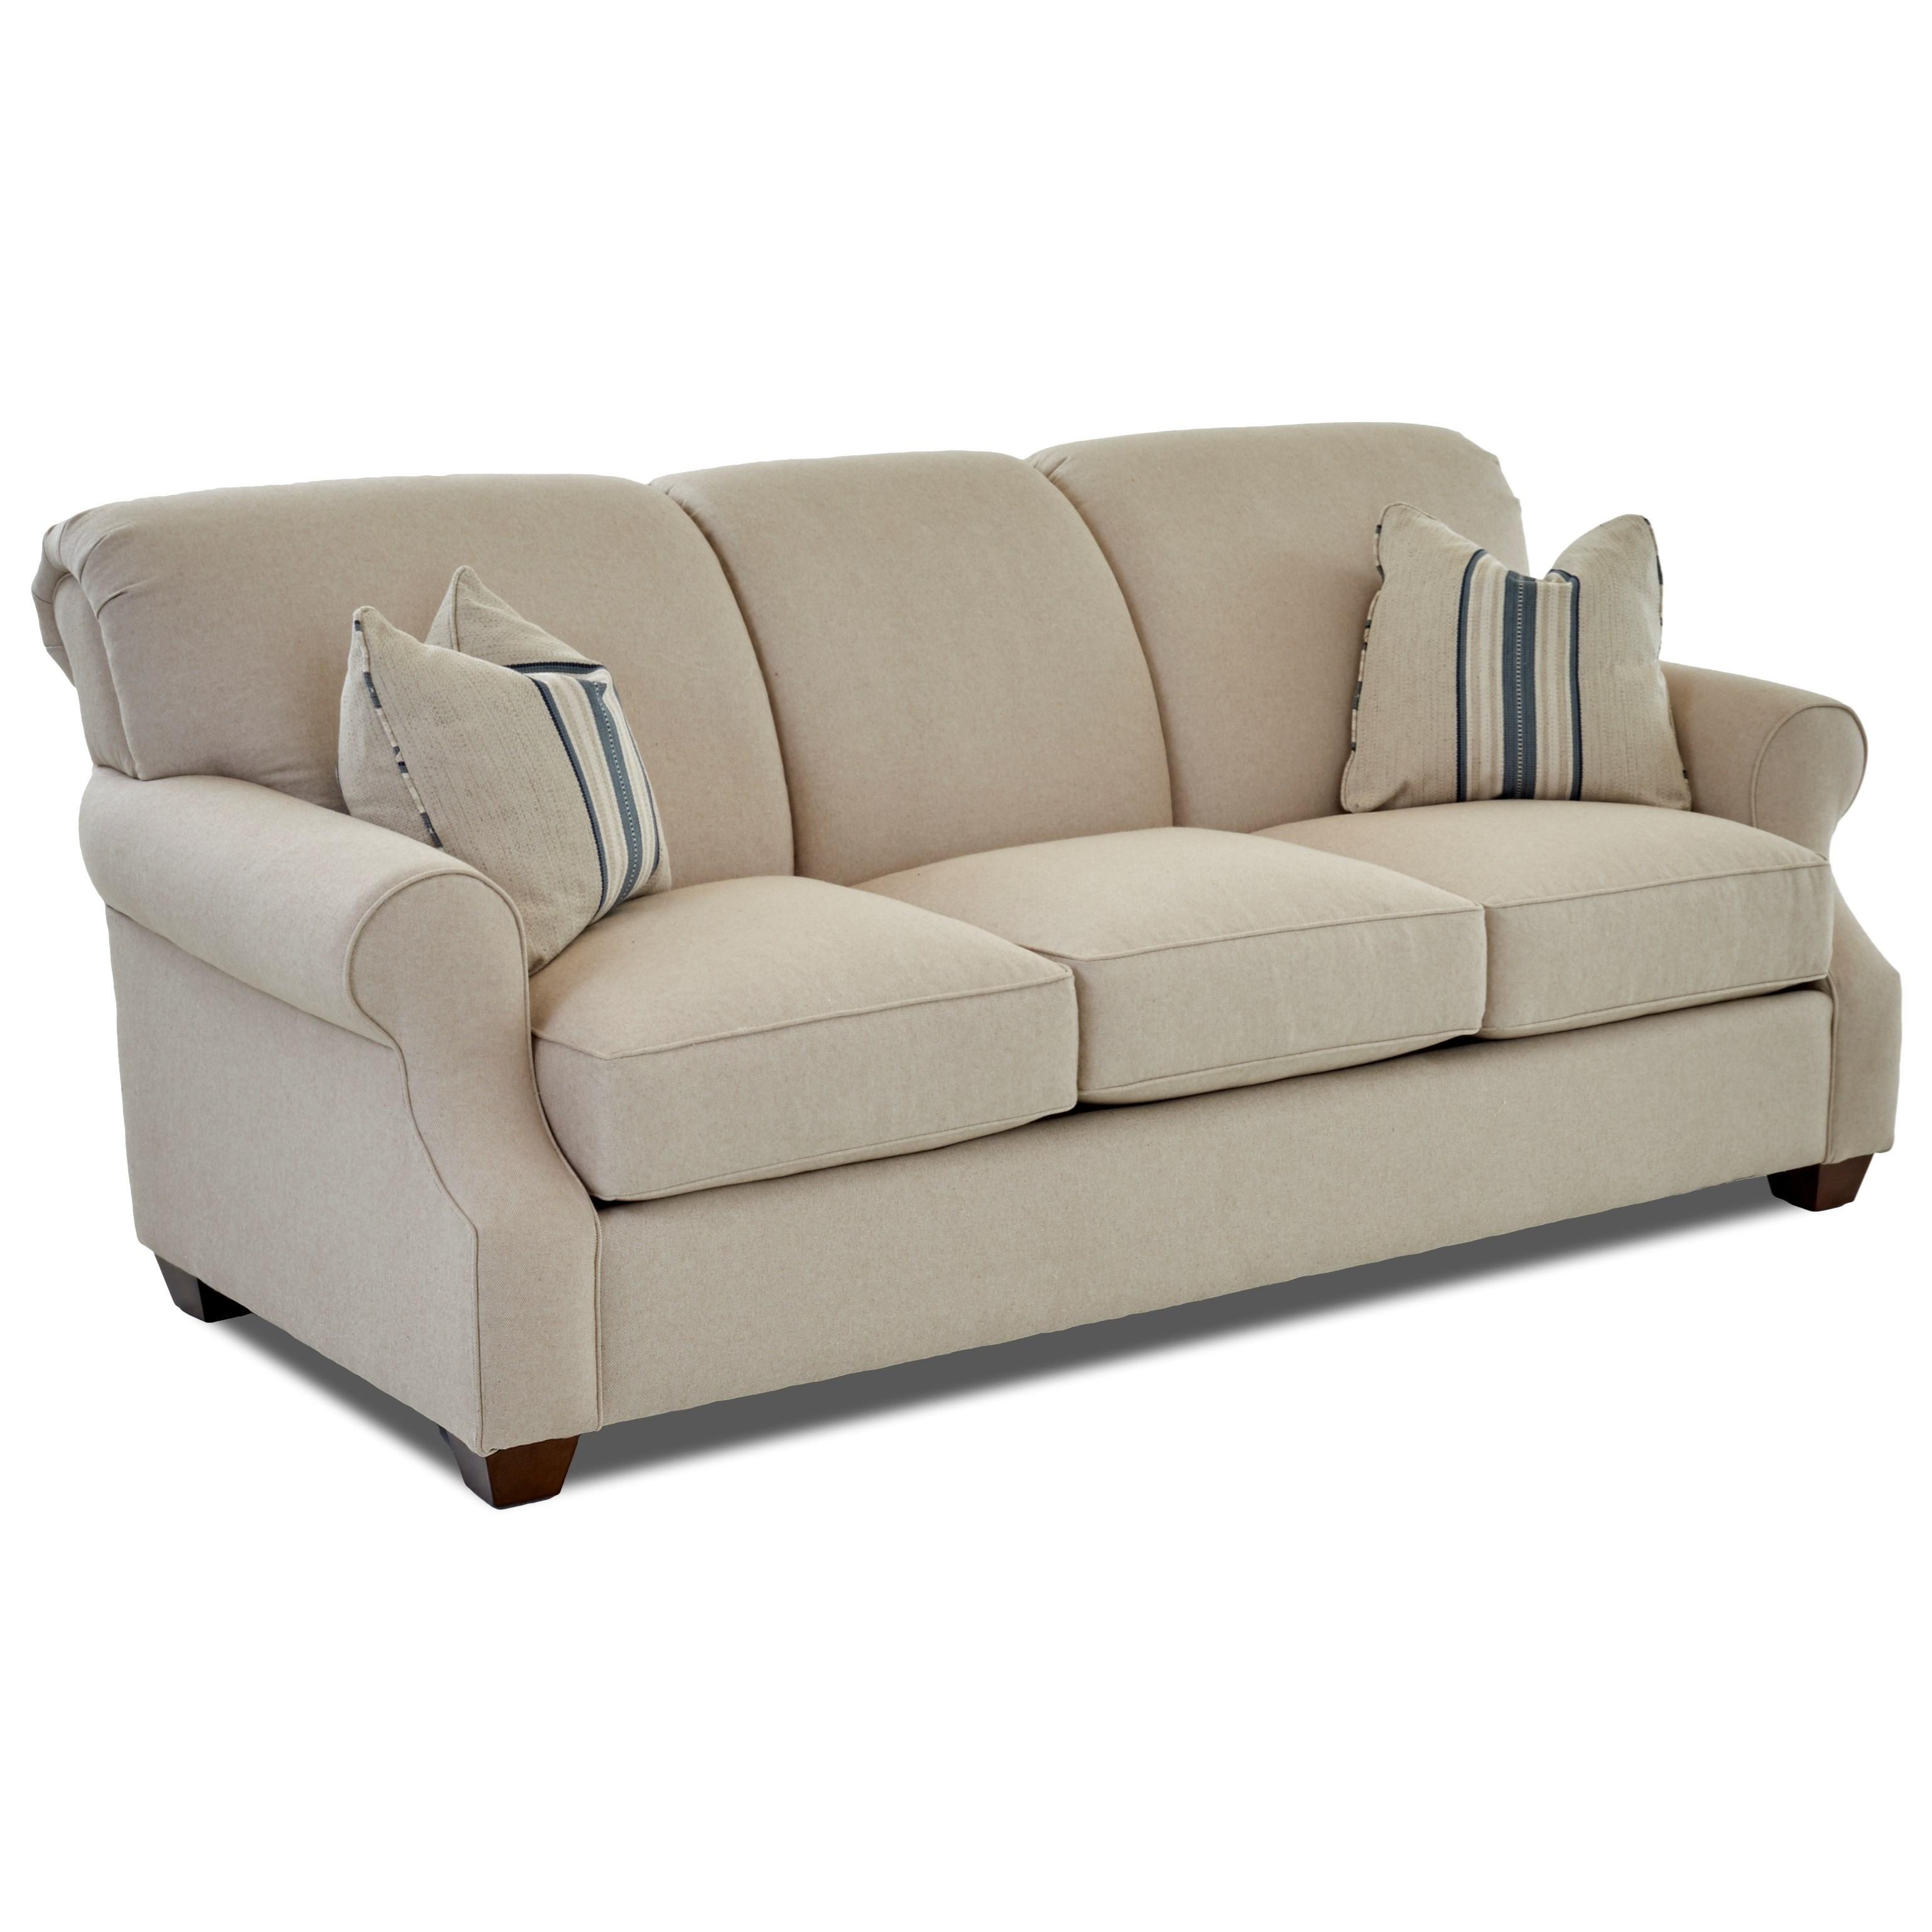 Klaussner Olivia K68500 Dqsl Casual Dreamquest Queen Sofa